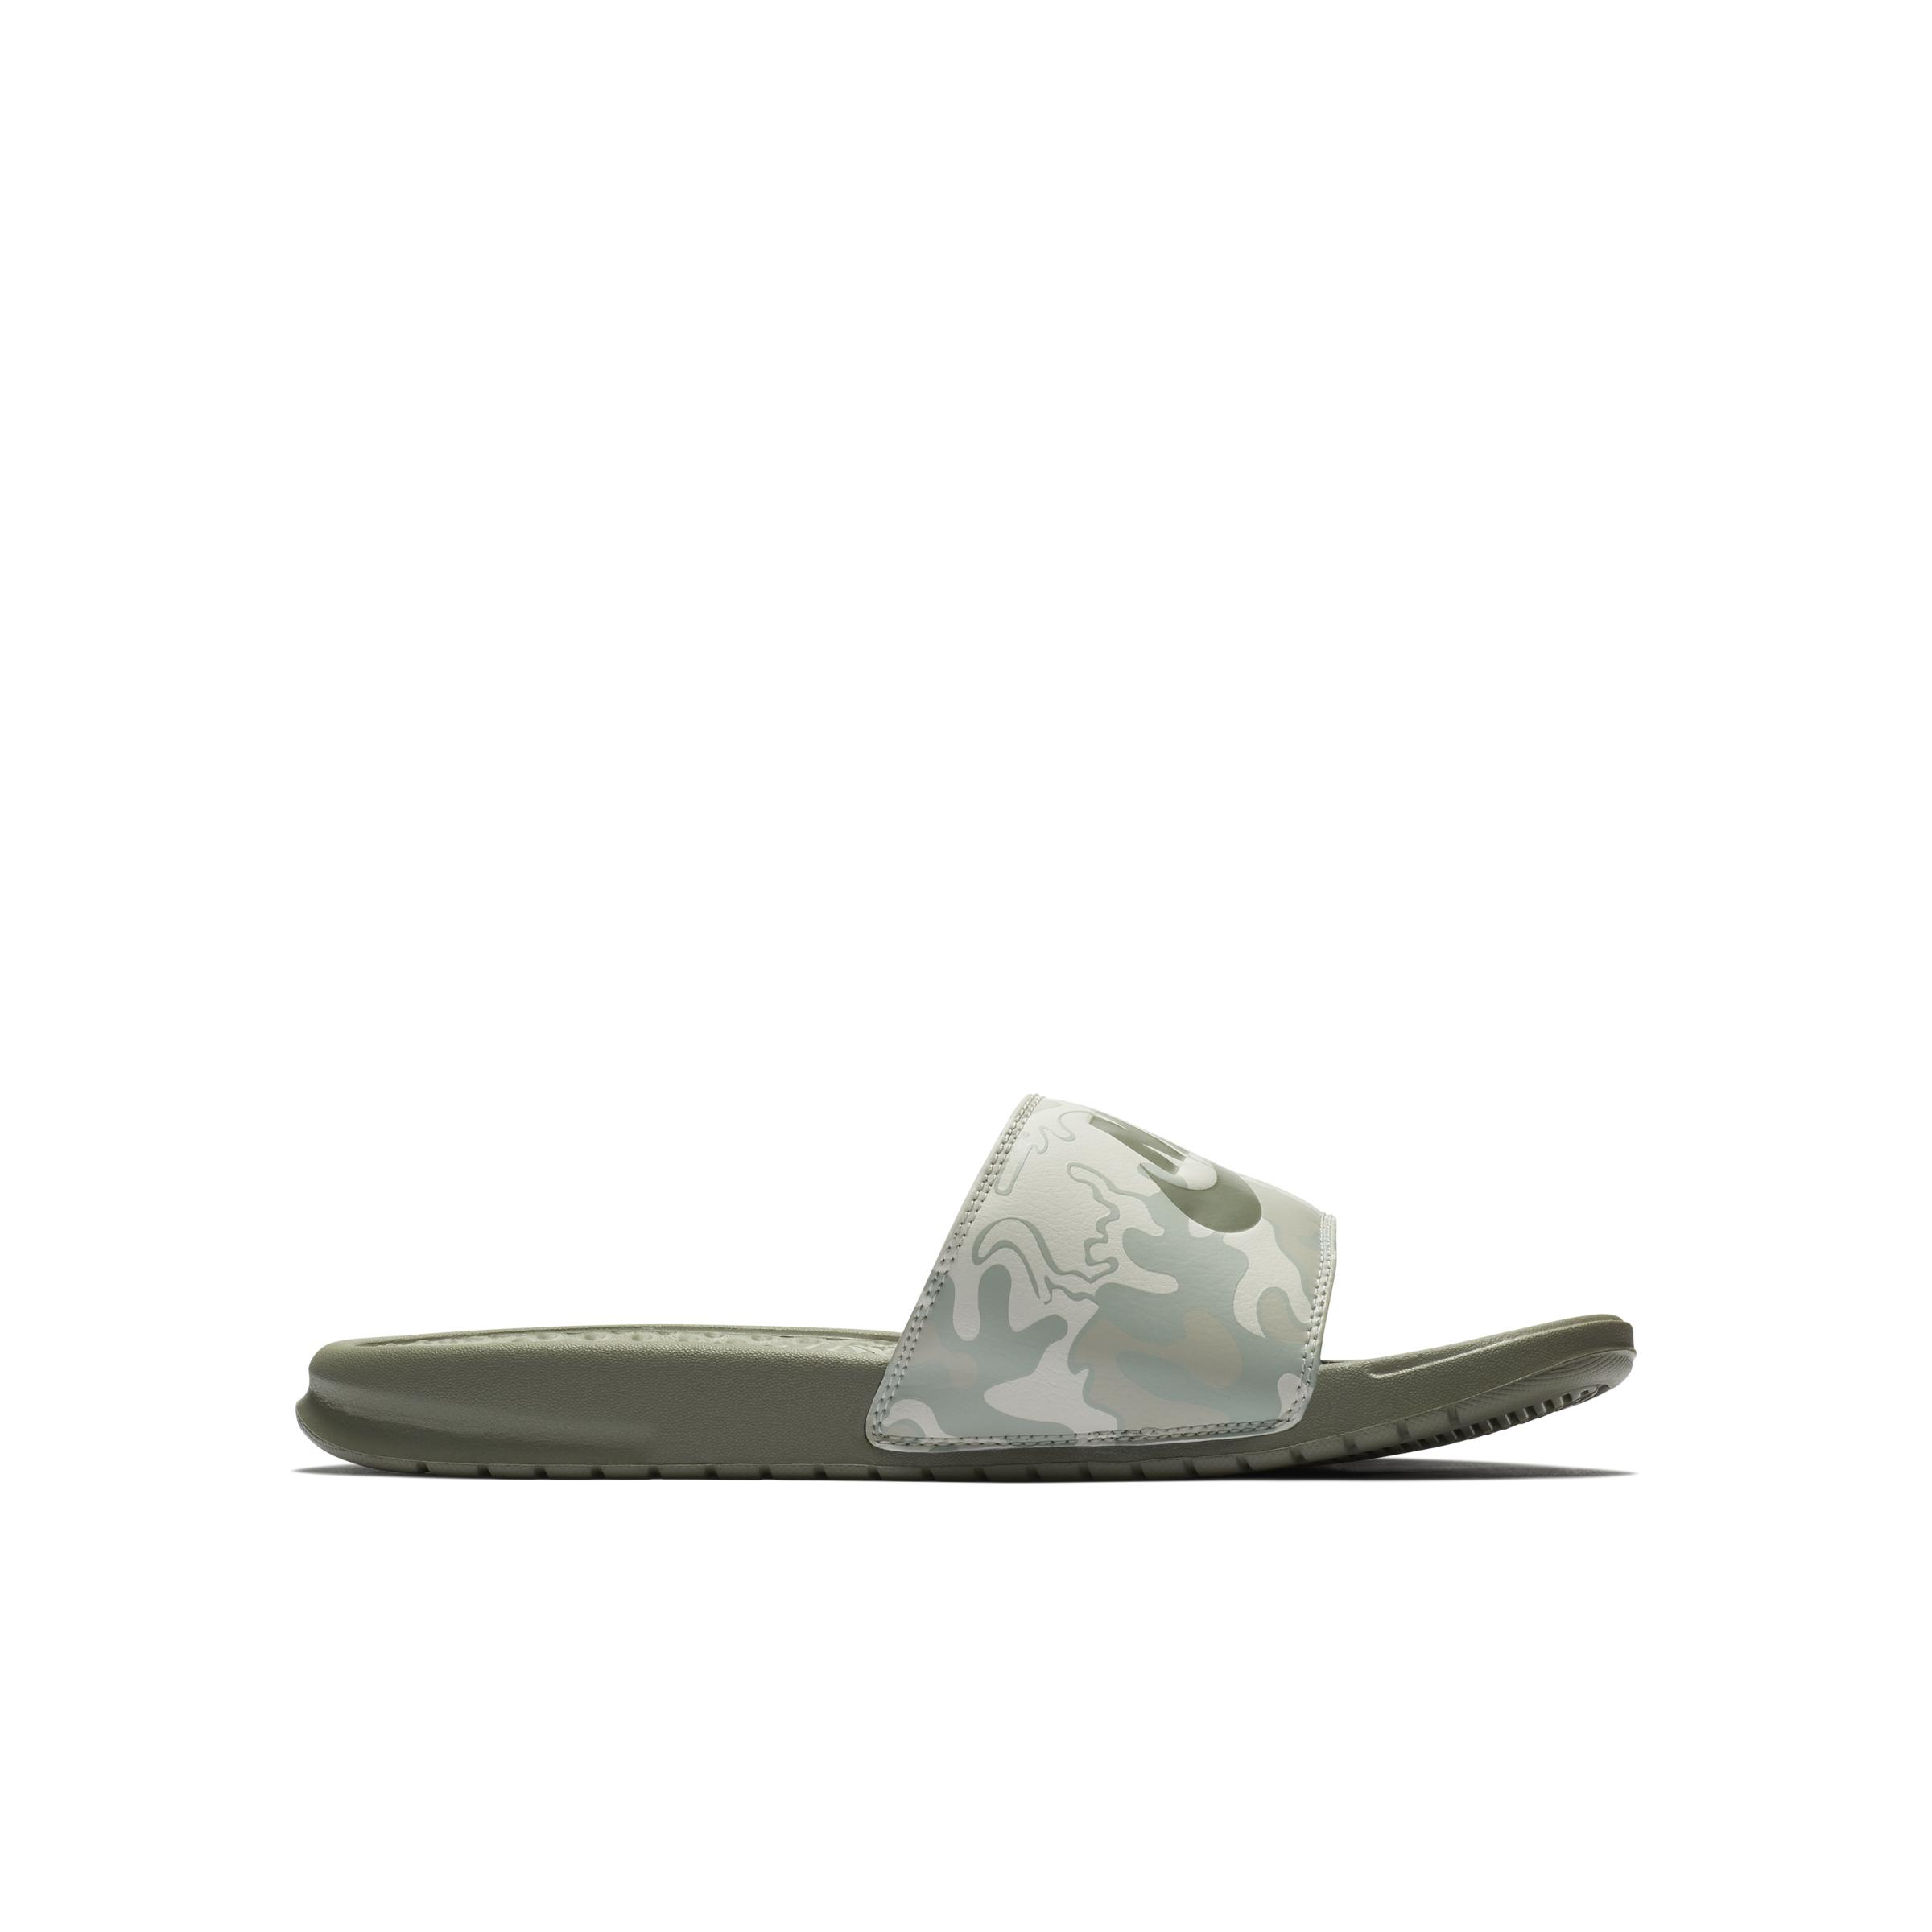 Nike Benassi JDI Printed Badeslipper in Grau für Herren Lyst